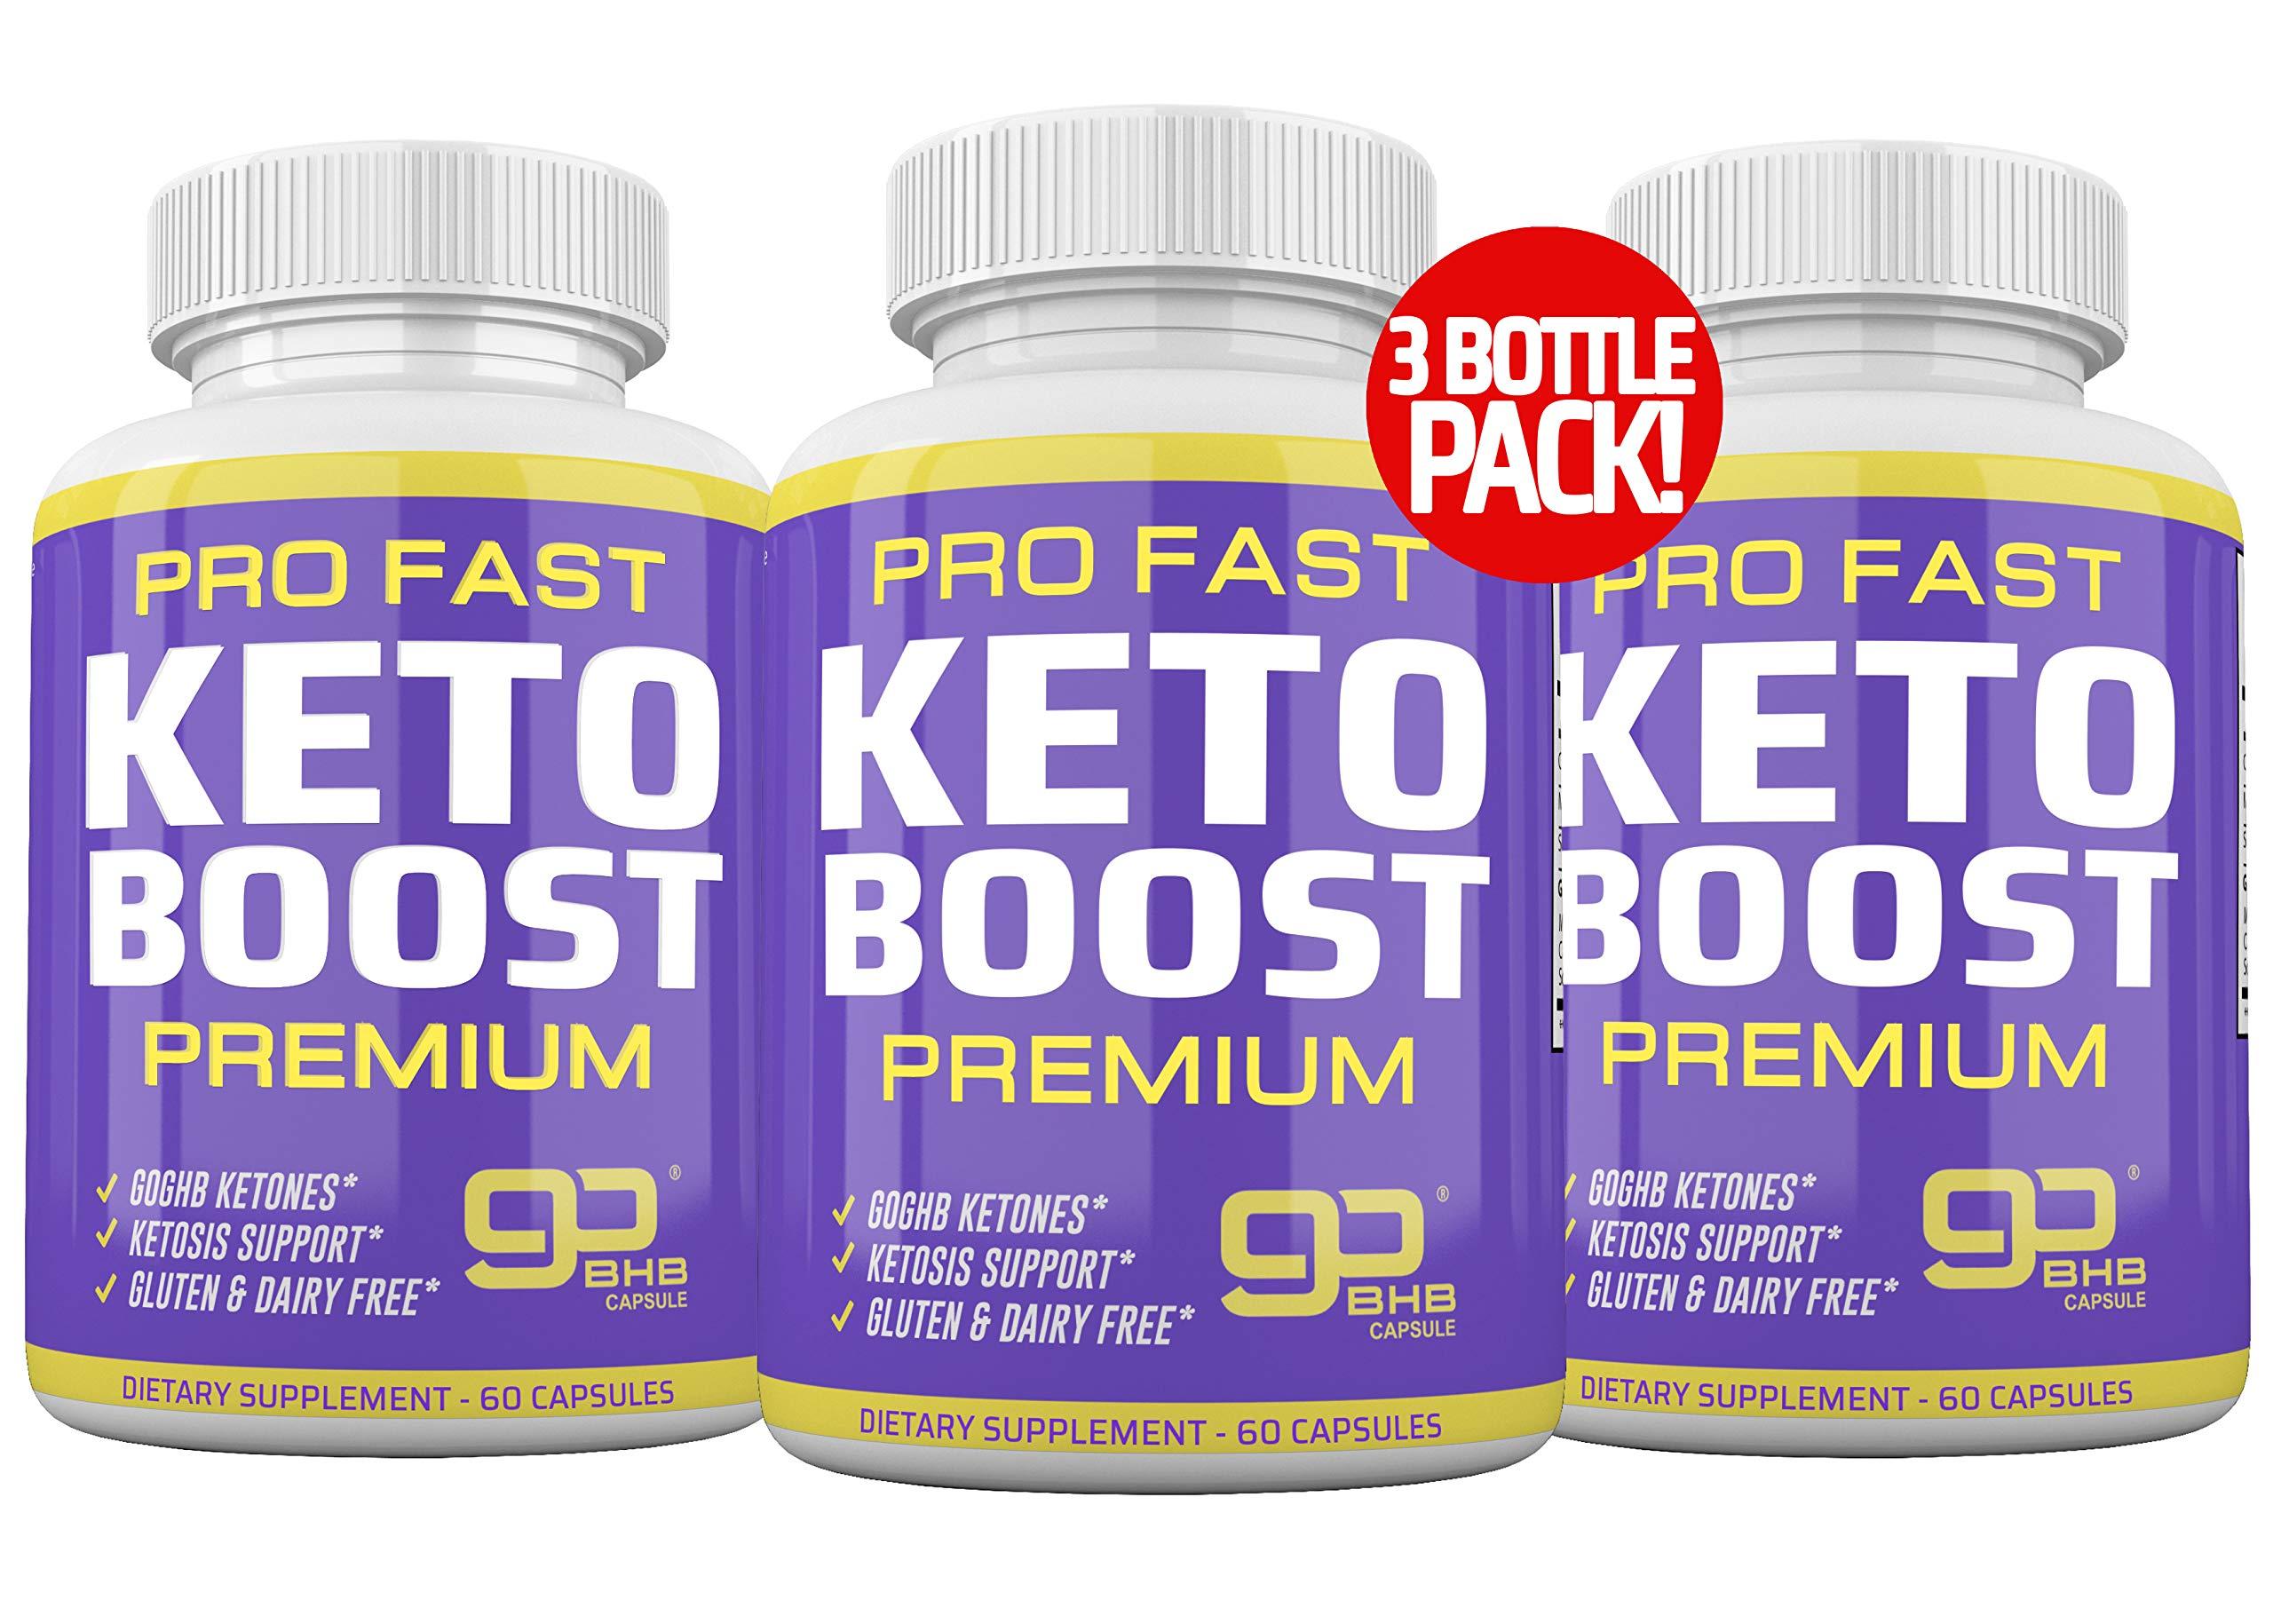 buy pro-fast diet pills